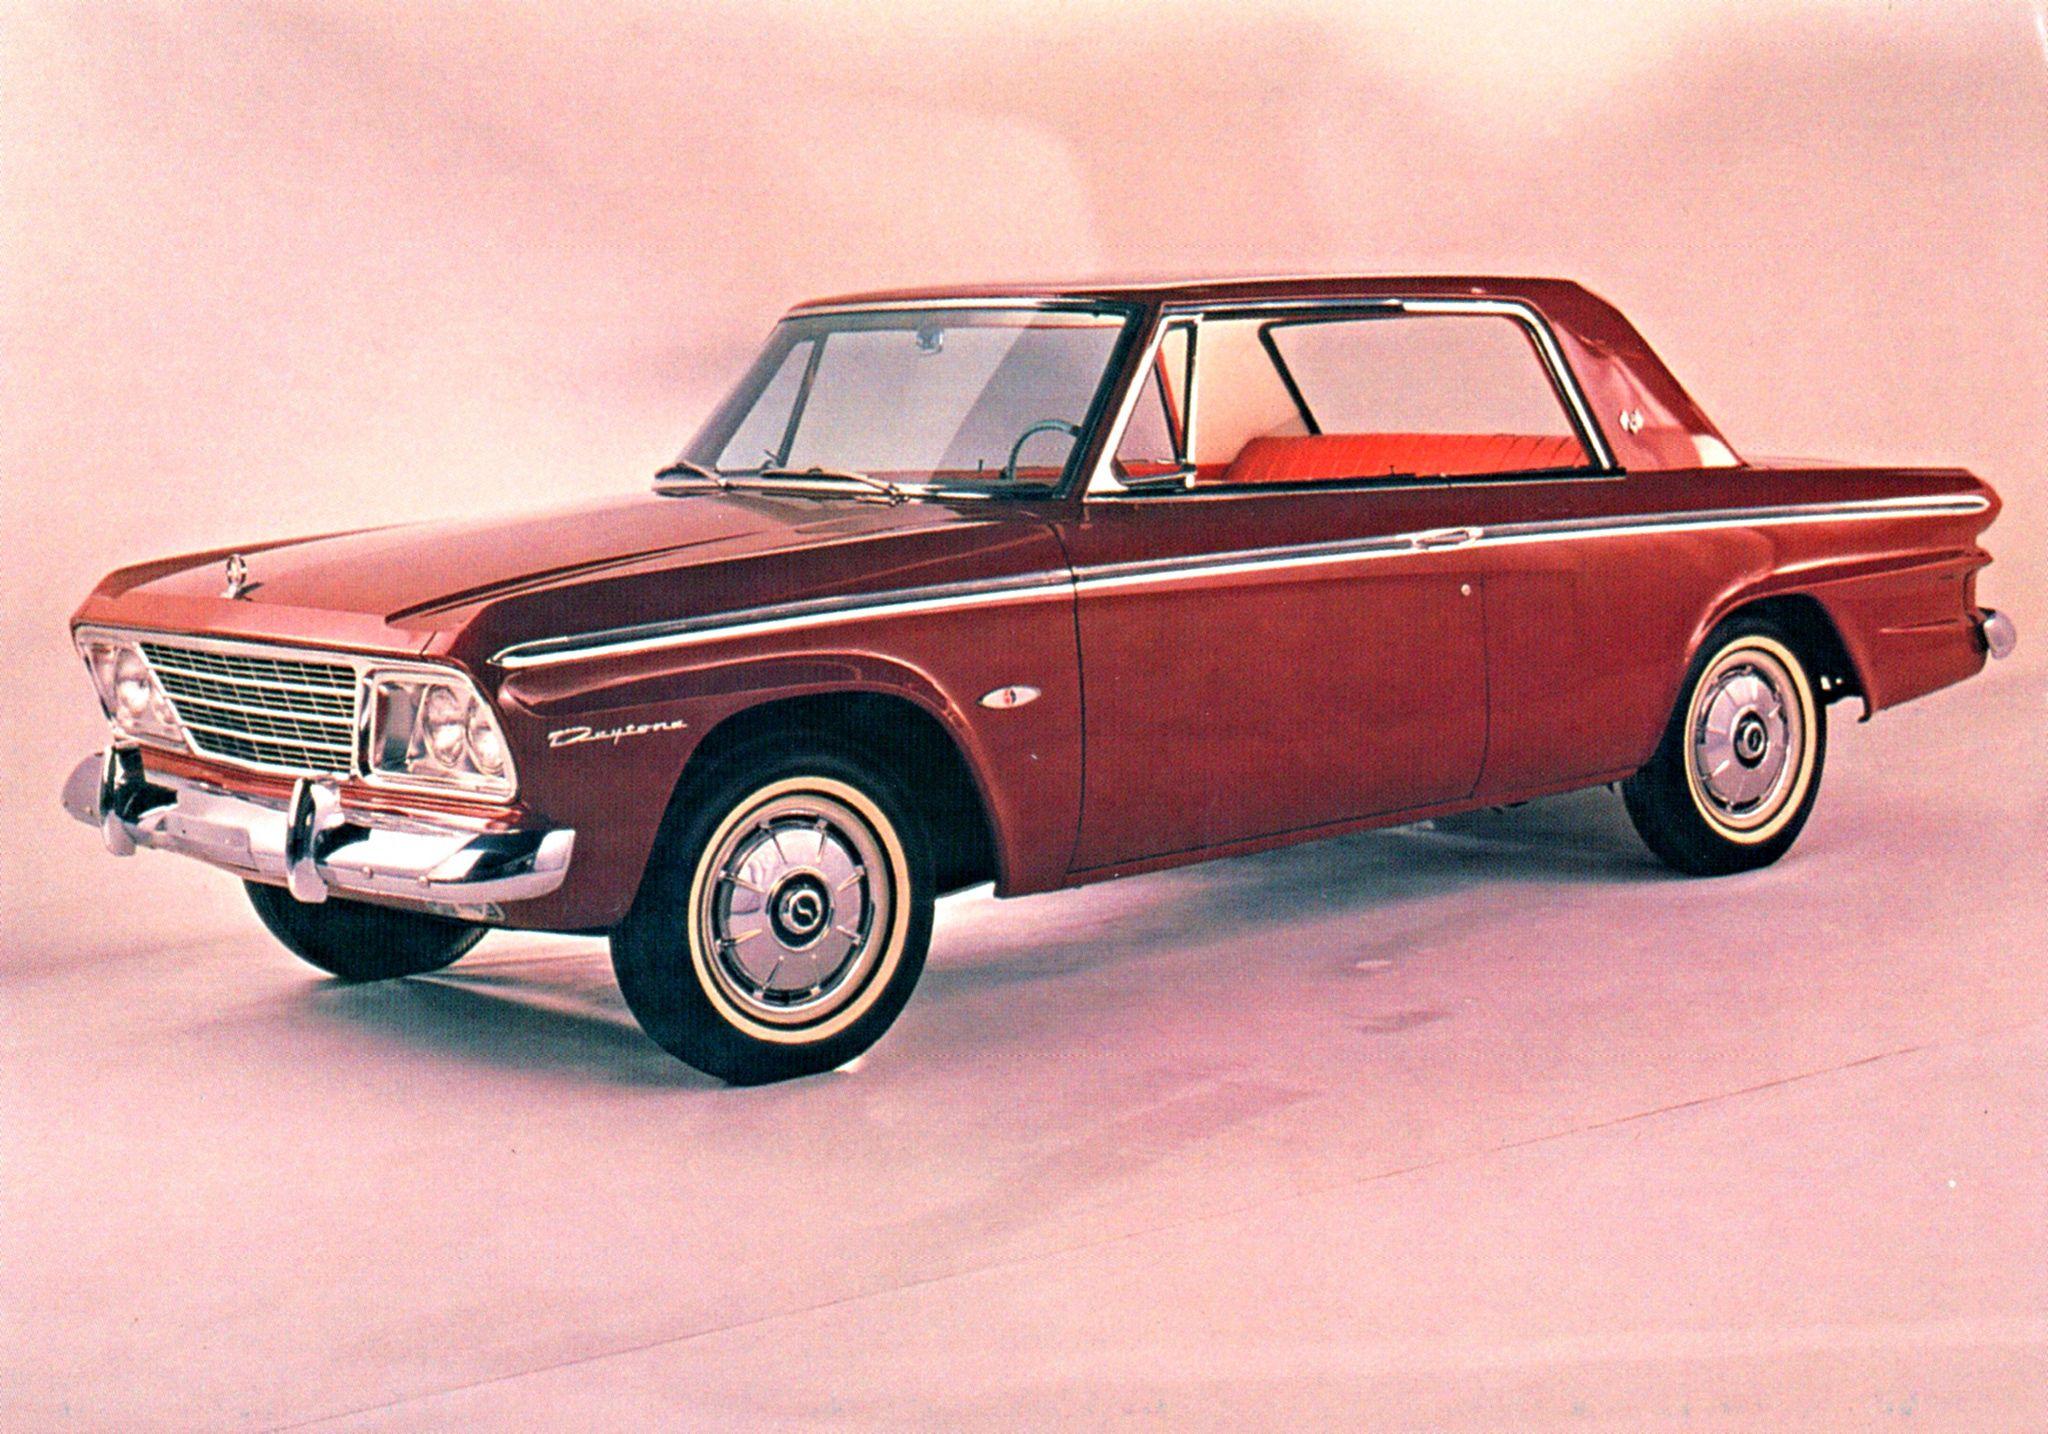 1964 Studebaker Daytona Hardtop Automobile companies